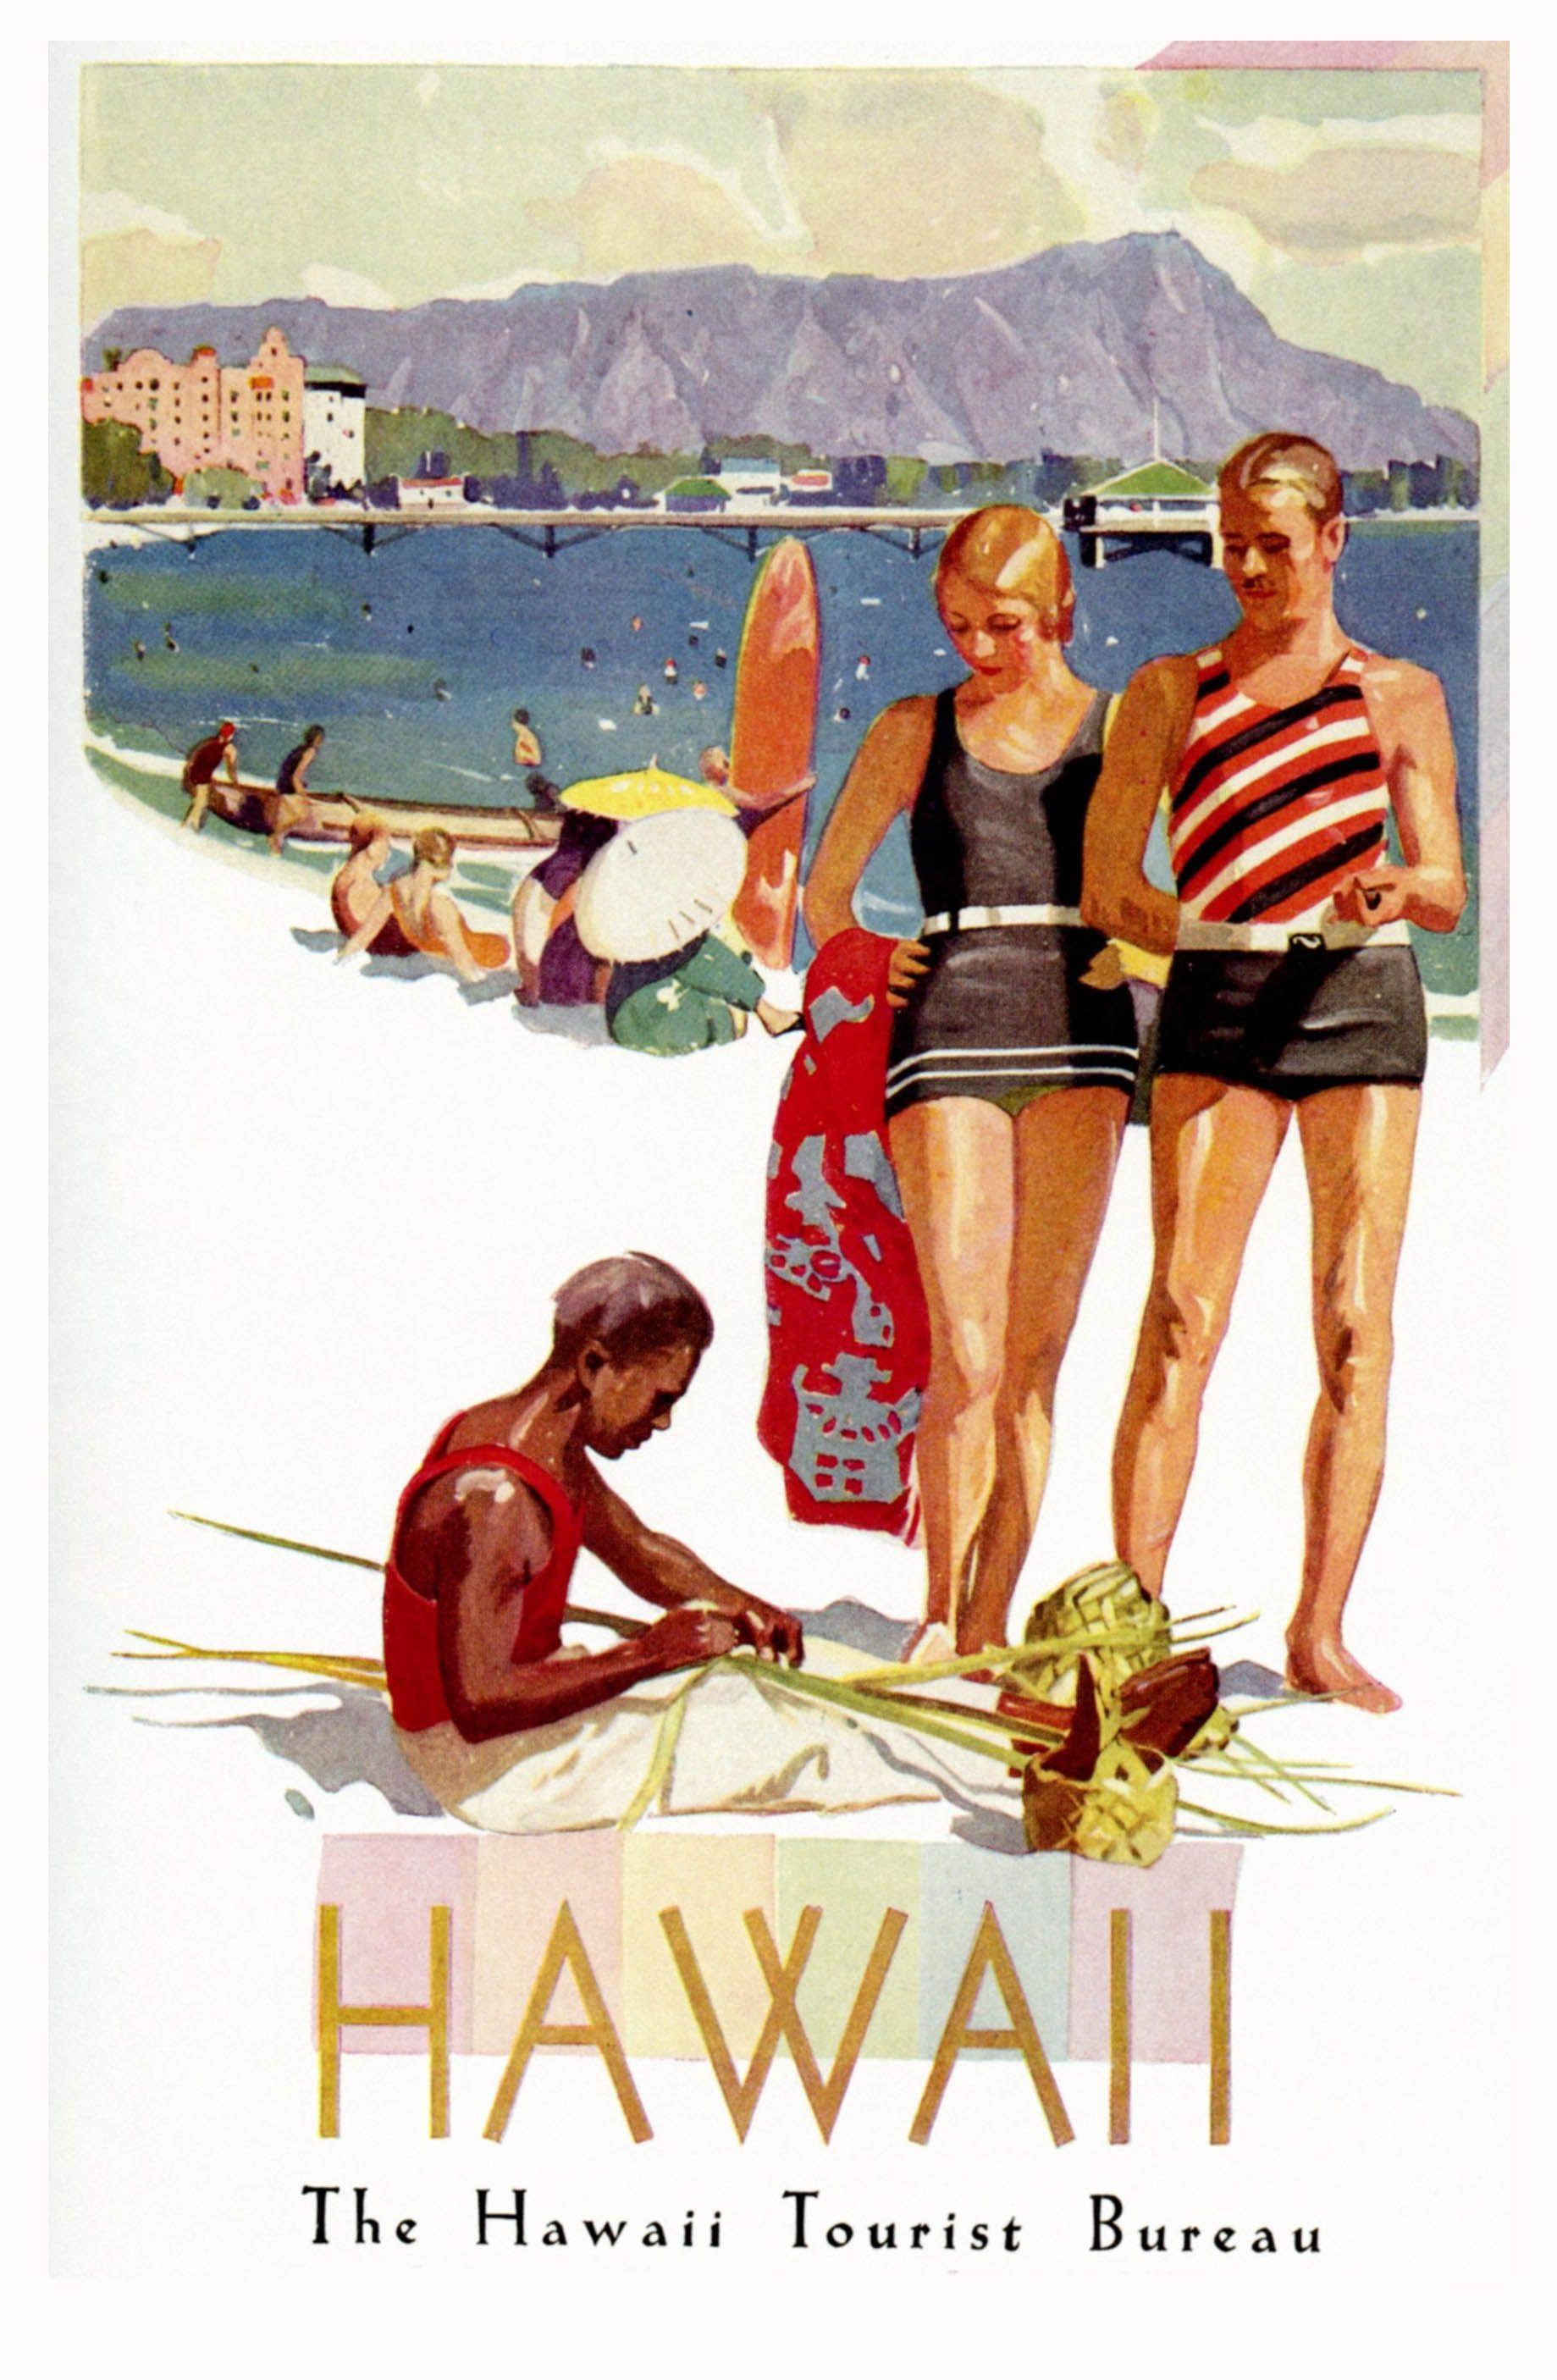 Hawaii 1929 Vintage Travel Beach Poster Vintage Beach Posters